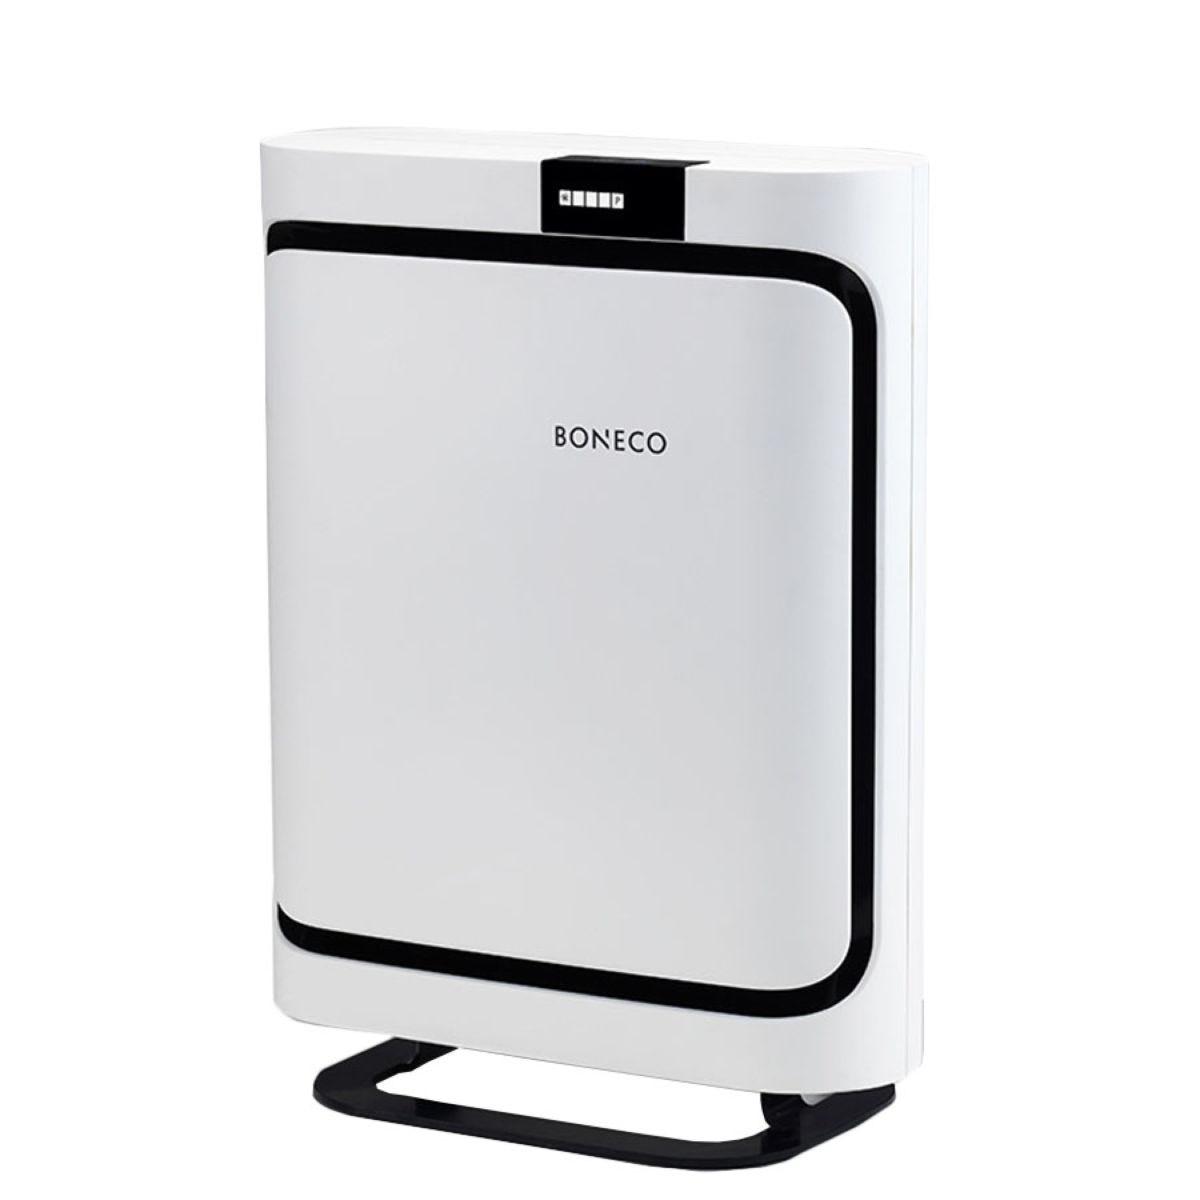 Boneco Air Purifier P400 with Digital Display